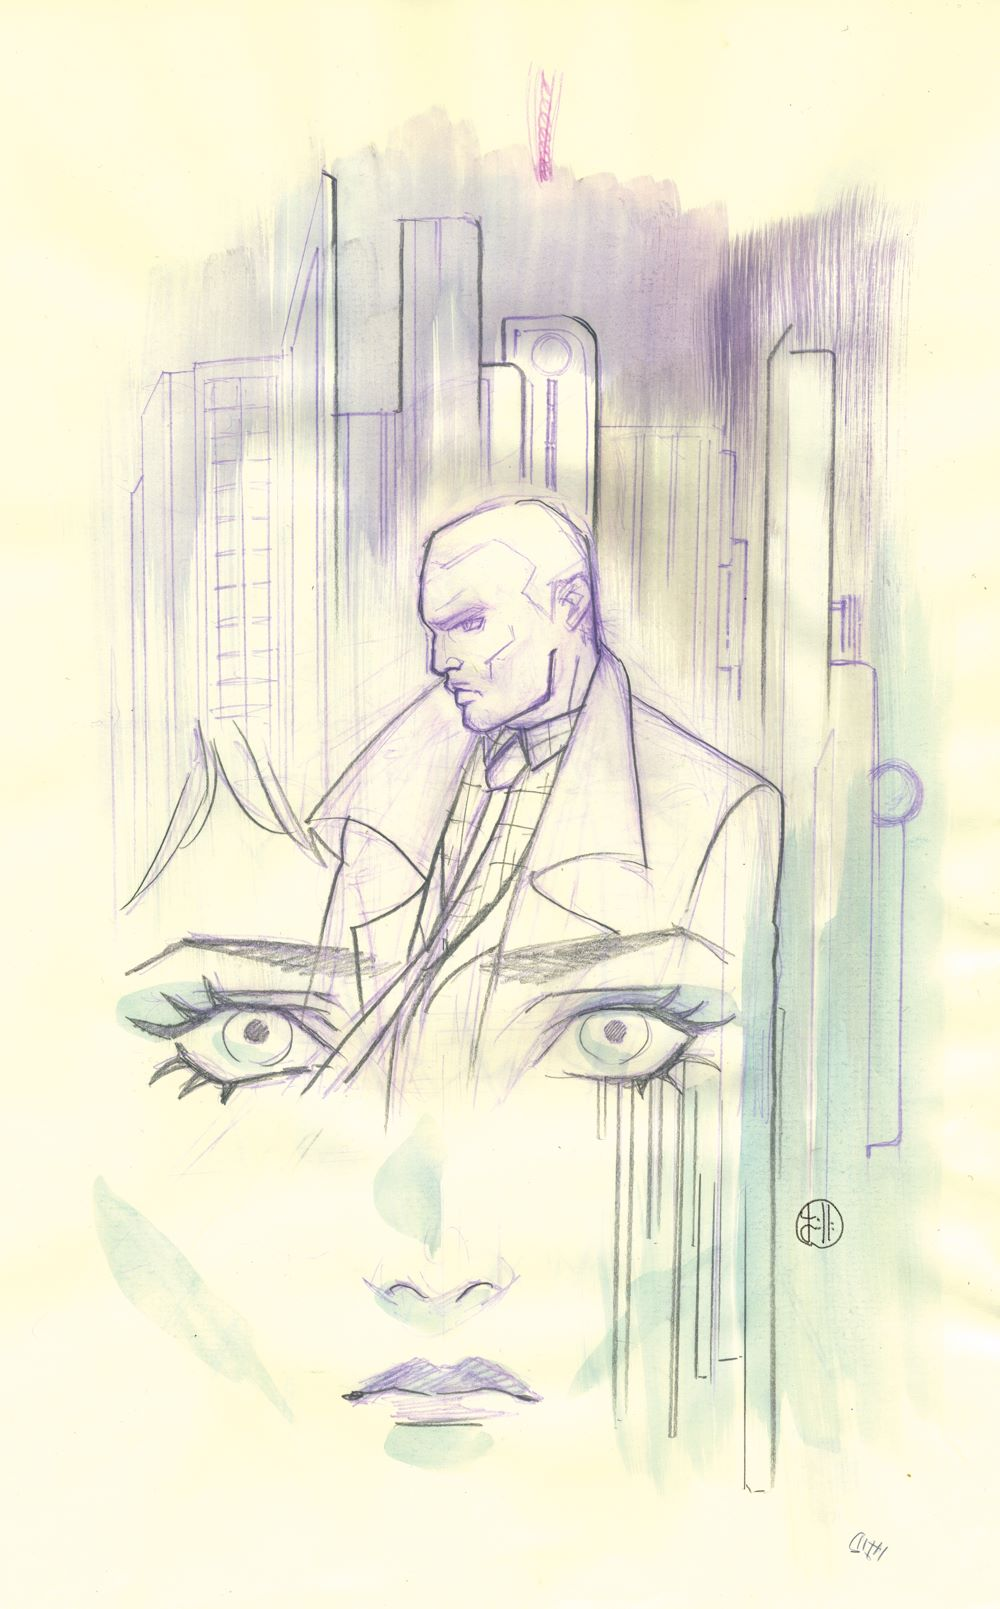 Blade-Runner-Origins_1_G_FOC-MOMOKO-VAR ComicList: Titan Comics New Releases for 03/10/2021